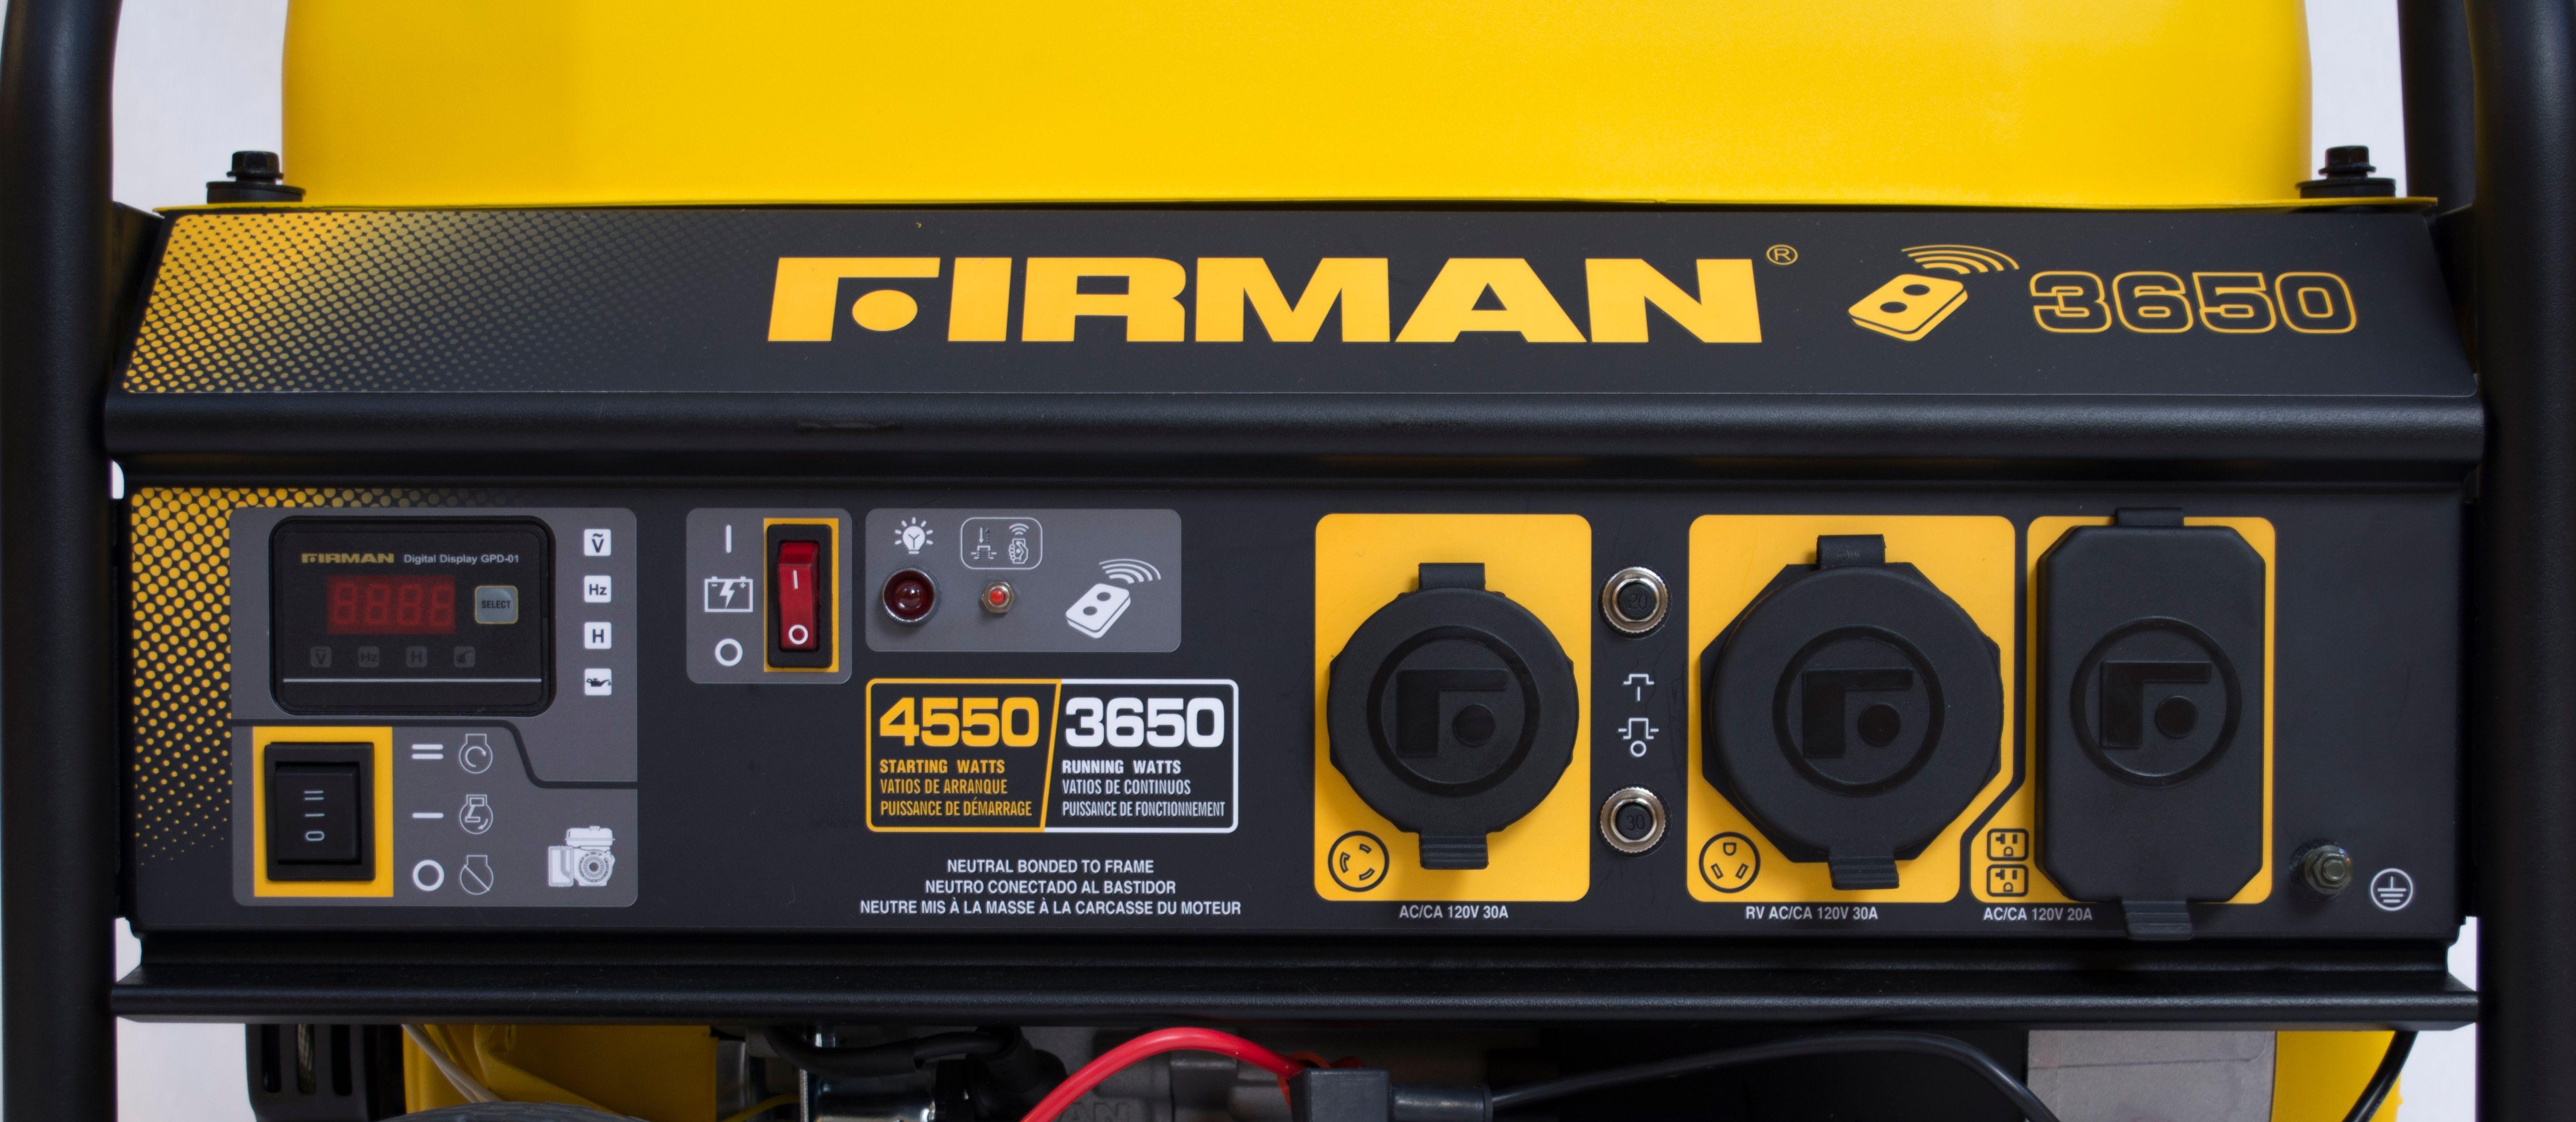 Firman 3650W Running / 4500W Peak Gasoline Powered Generator with Remote  Start